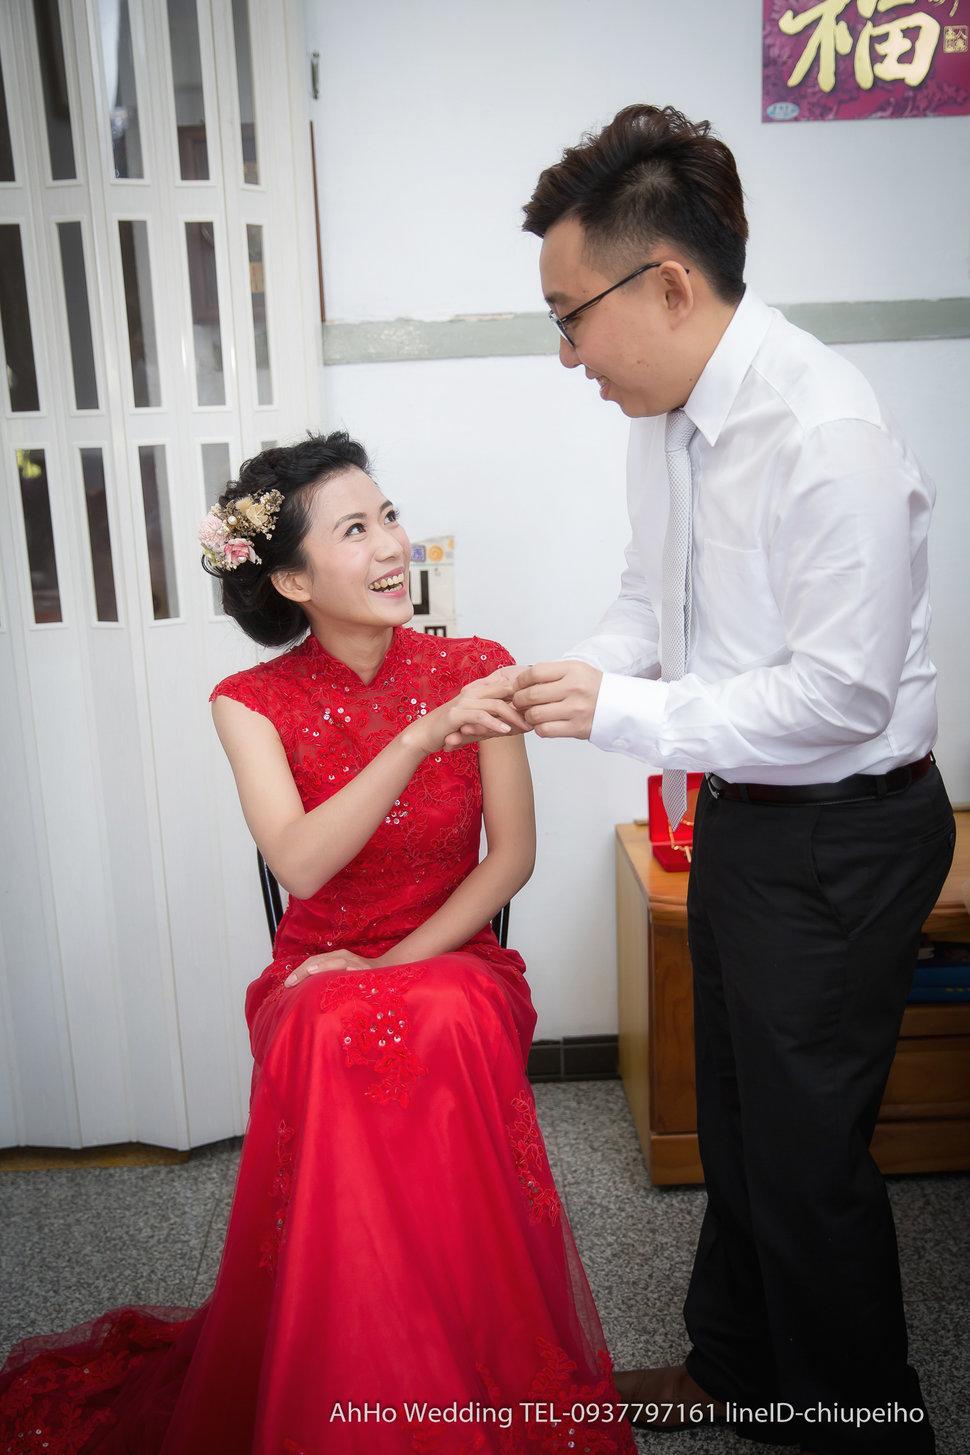 AhHo Wedding TEL-0937797161 lineID-chiupeiho (39 - 163) - AhHoWedding/阿河婚攝《結婚吧》